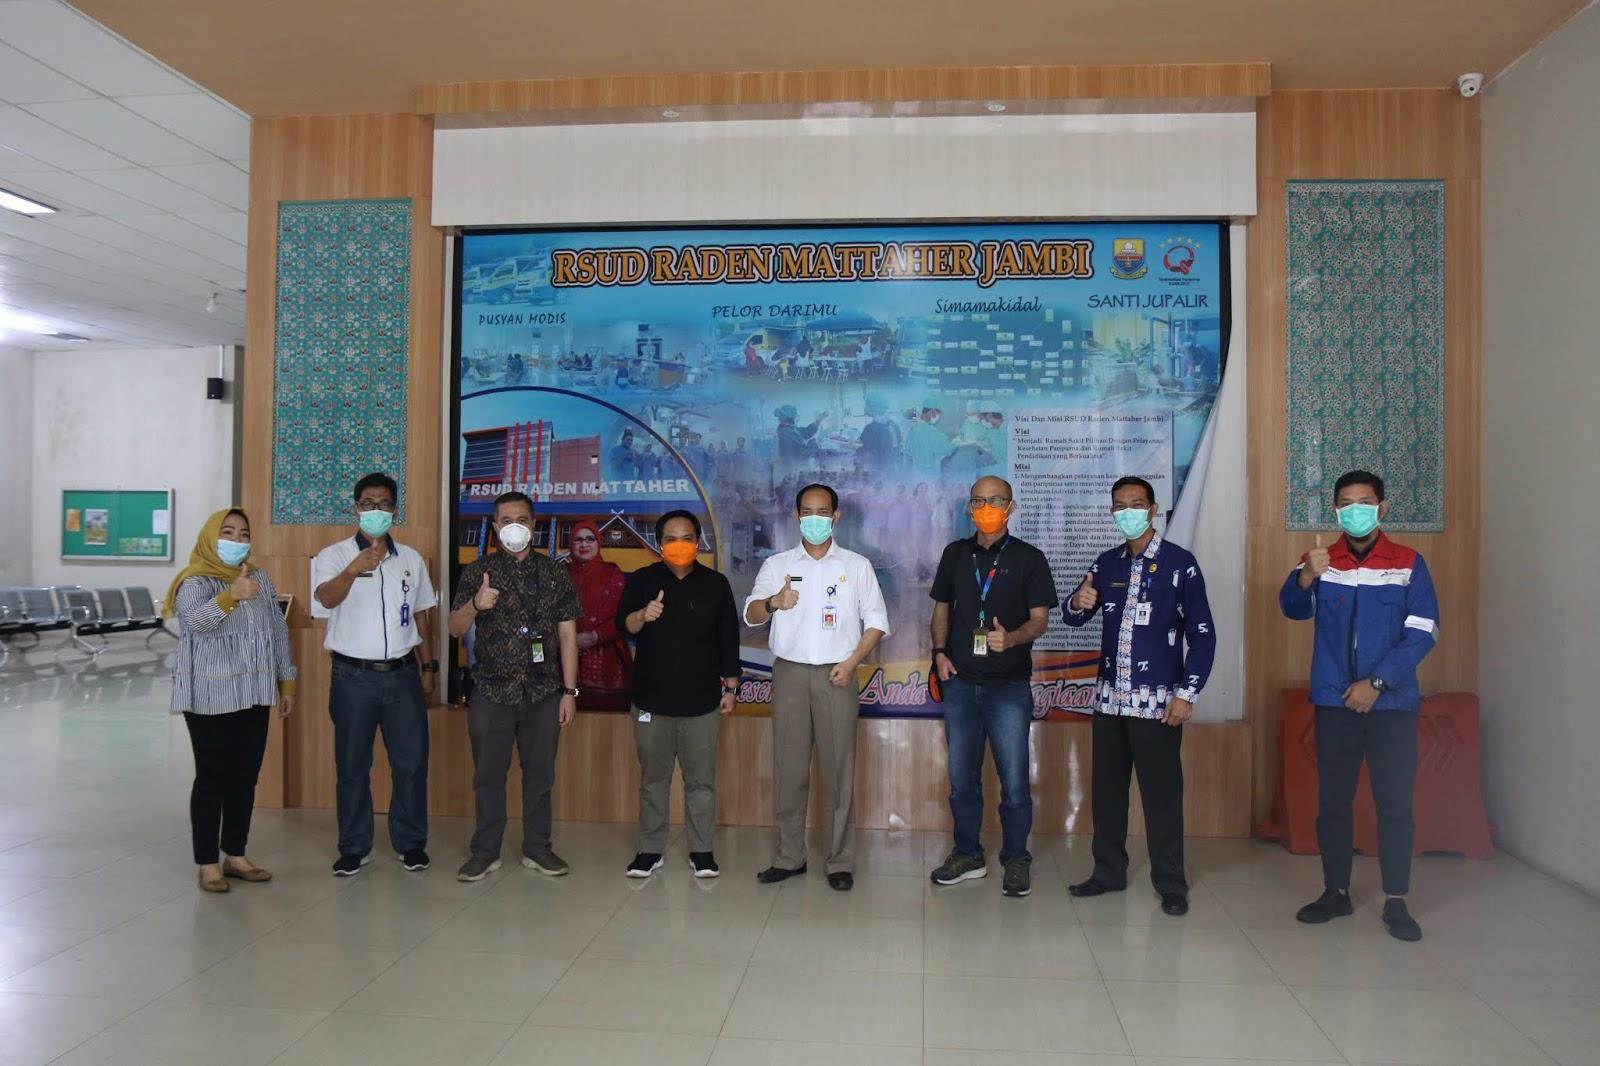 SKK Migas – KKKS Pertamina EP Asset 1 Jambi Field Bantu Ratusan APD Bagi Tenaga Medis RSUD Raden Mattaher Jambi